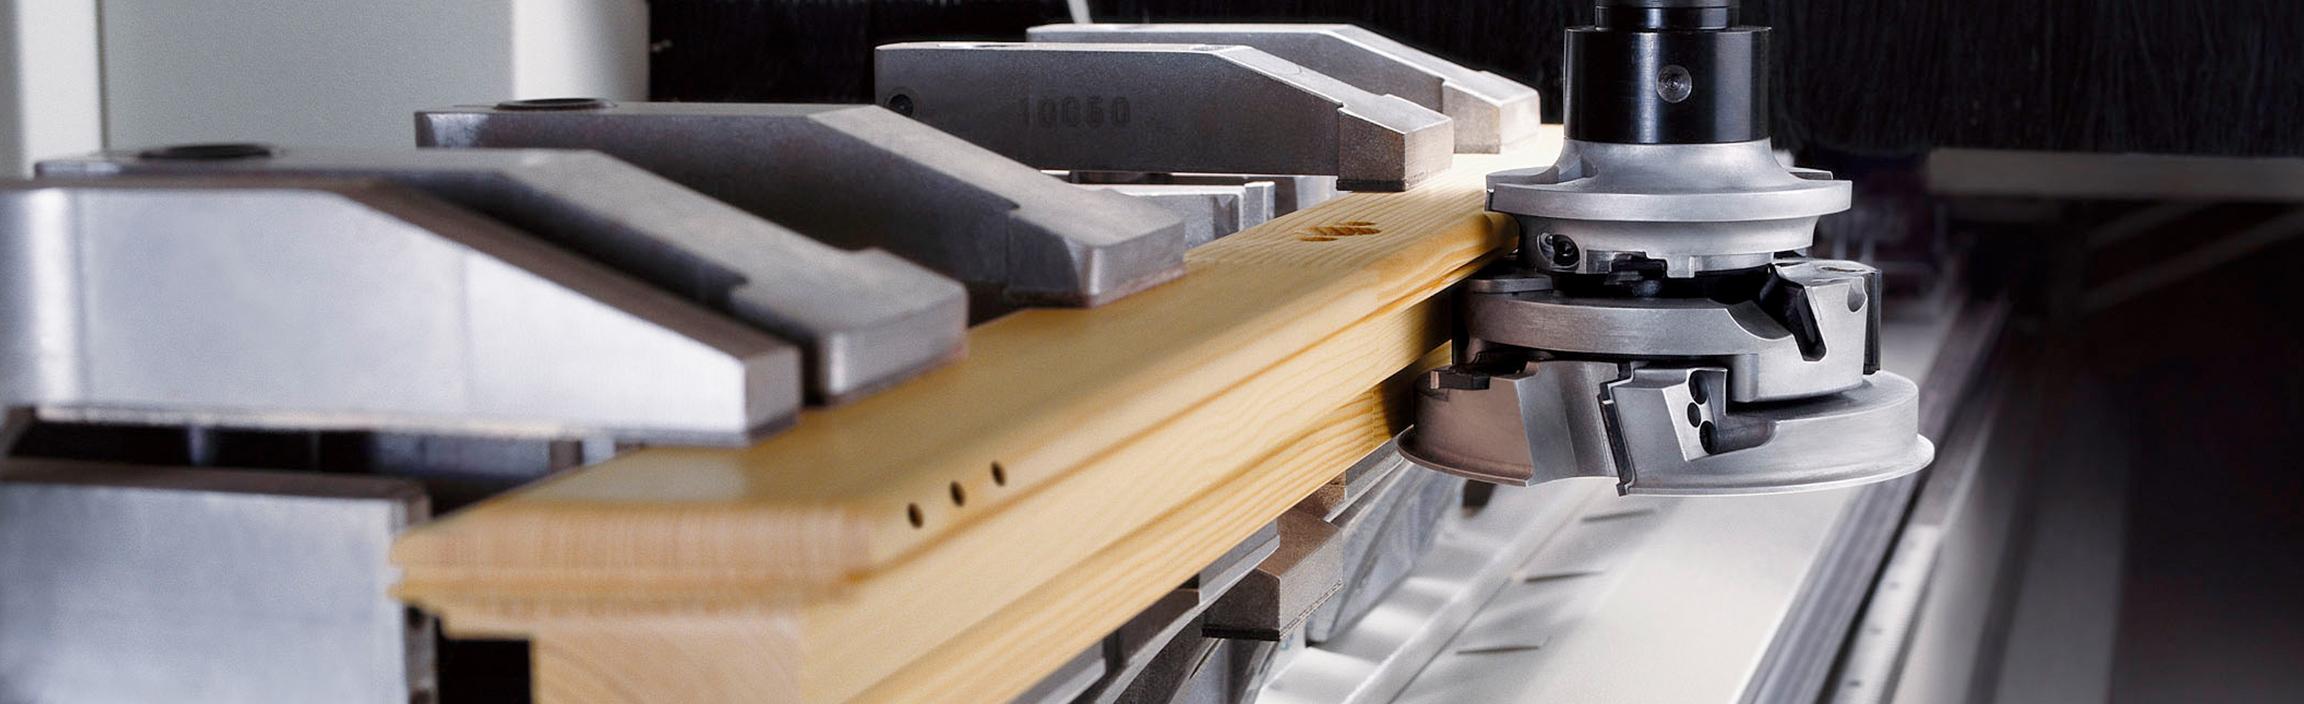 CNC vacatures